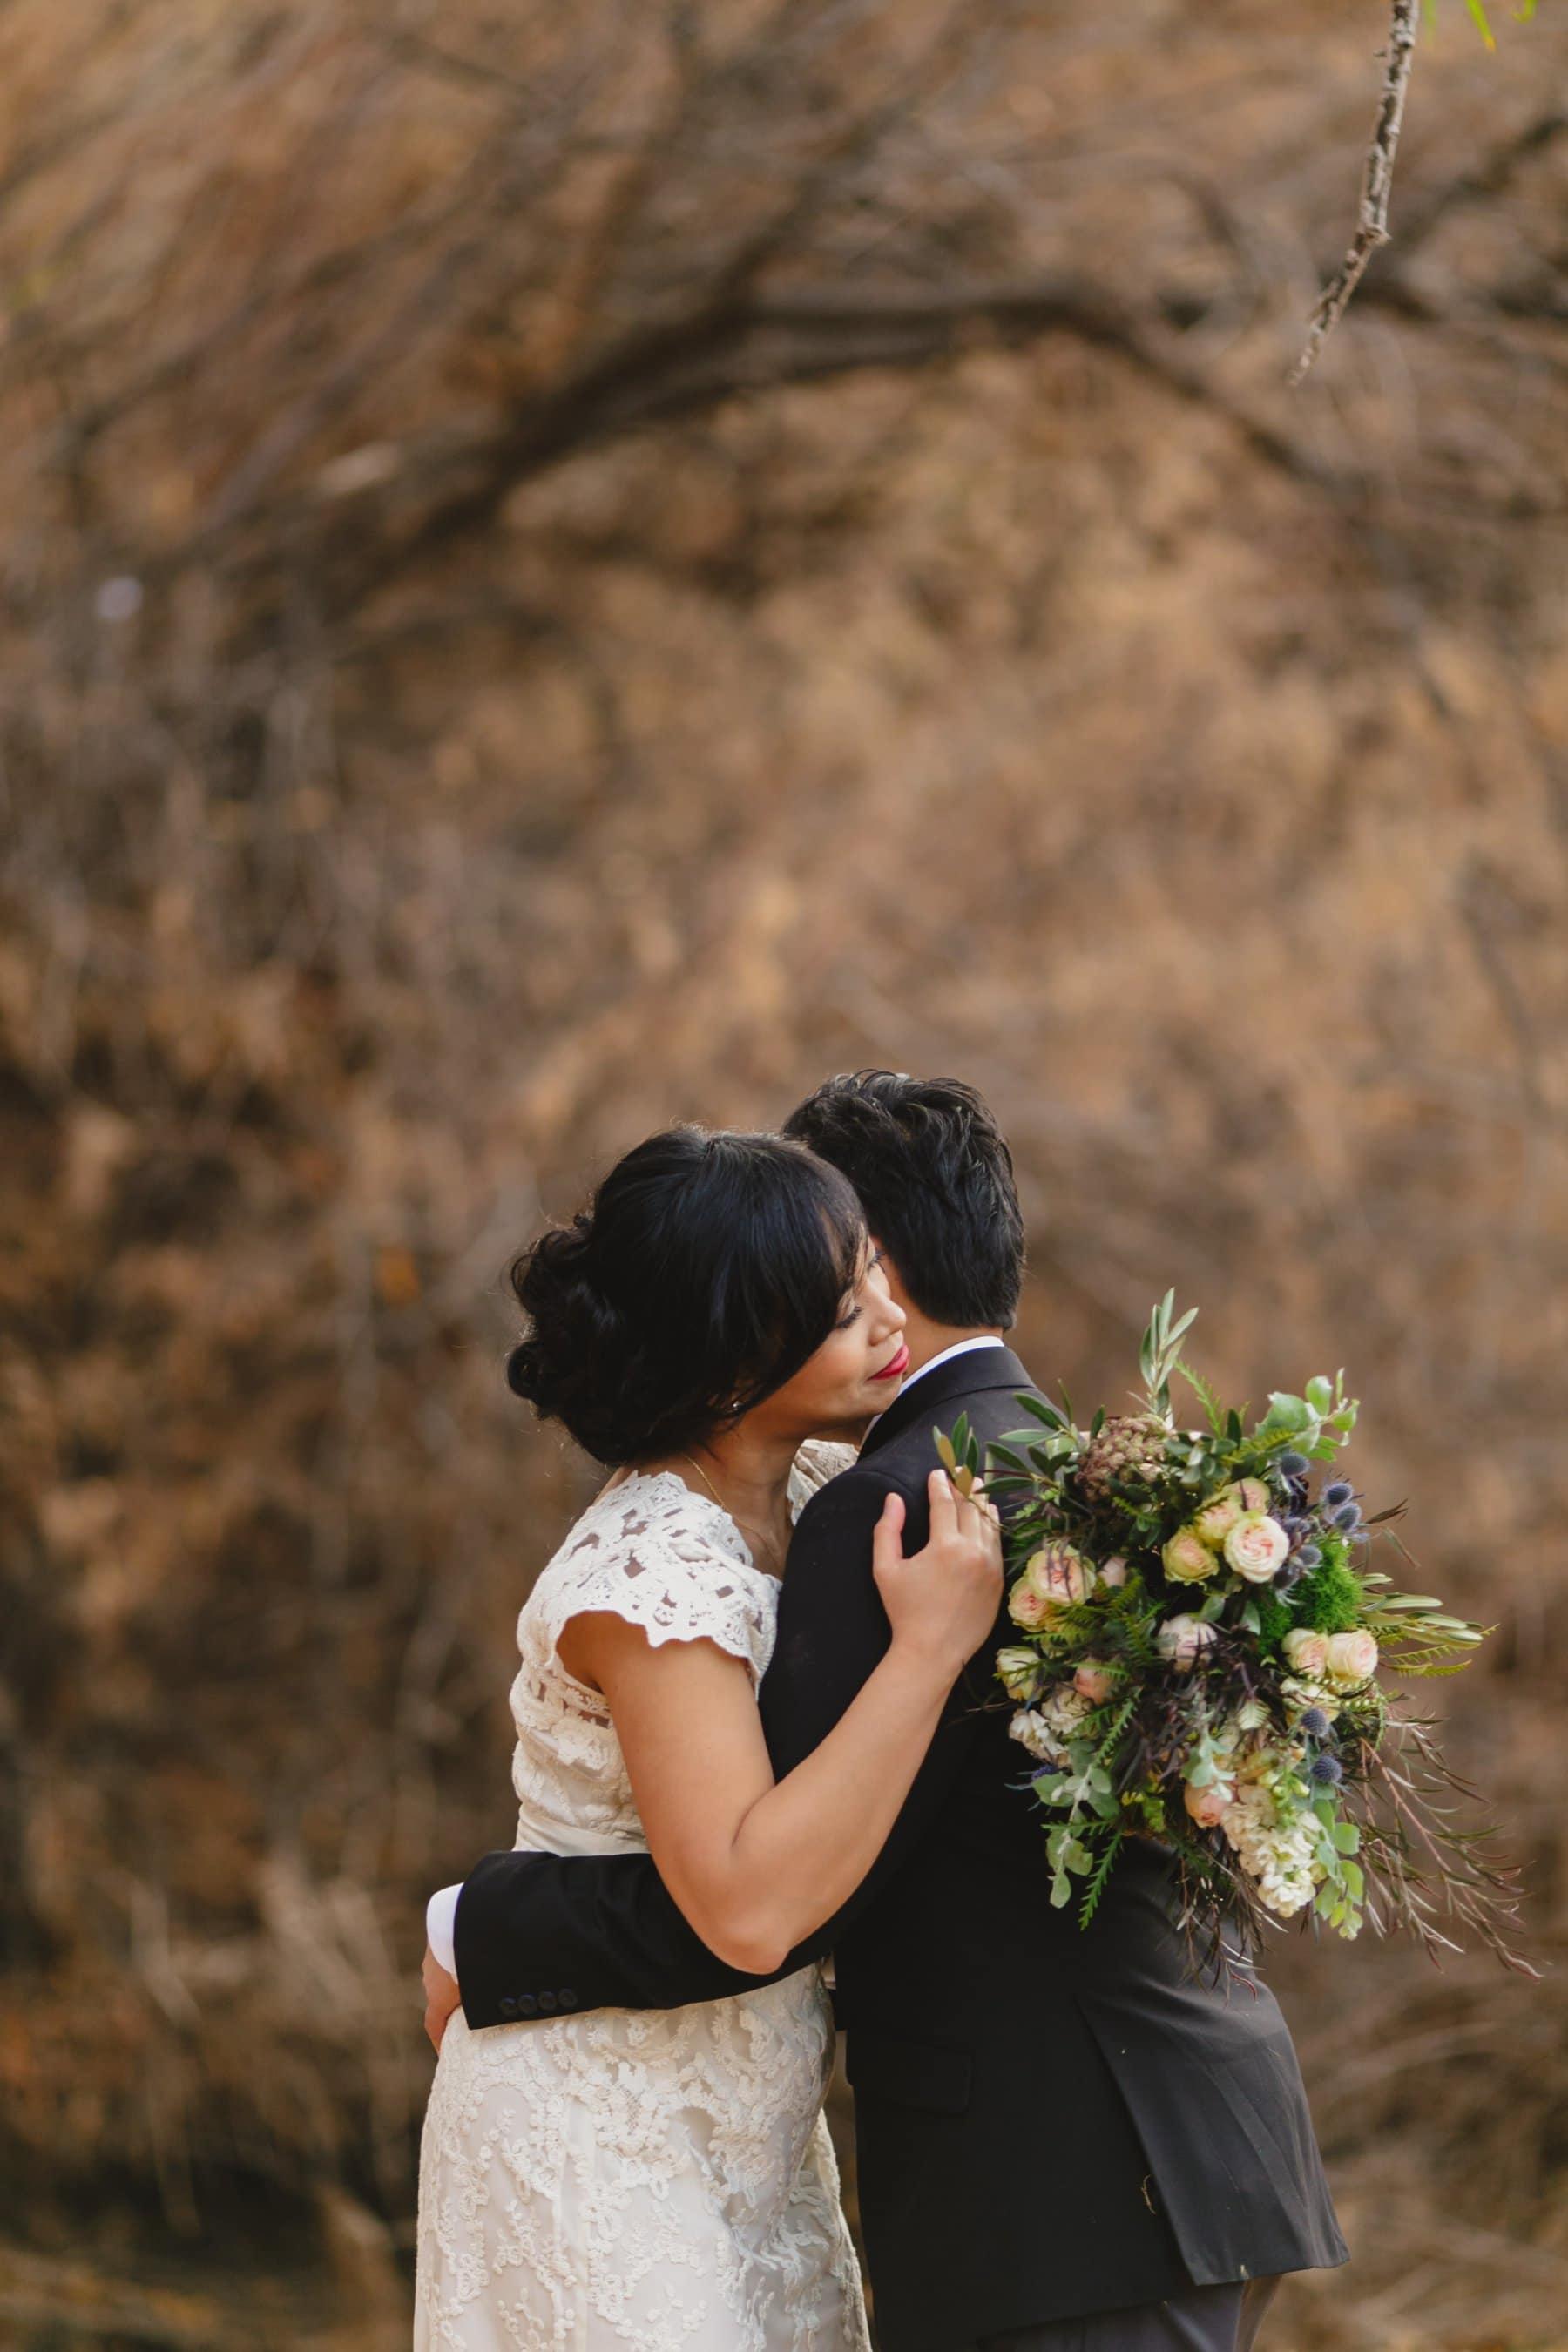 emotional candid wedding photos outdoor wedding in Arizona